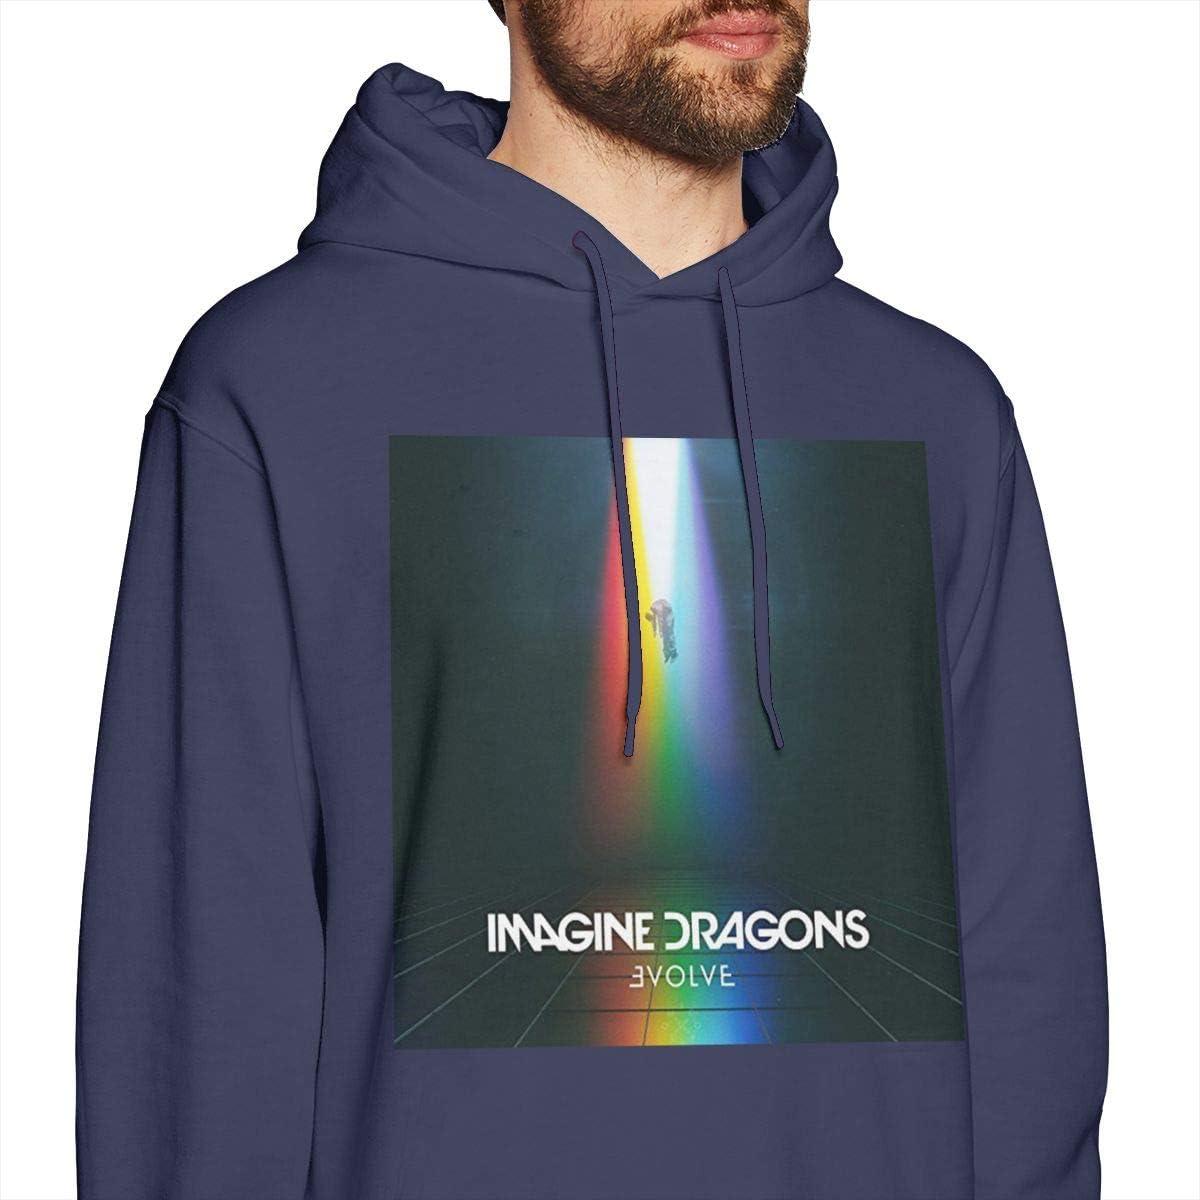 Mens Hooded Sweatshirt Imagine Dragons Personality Street Trend Creation Navy